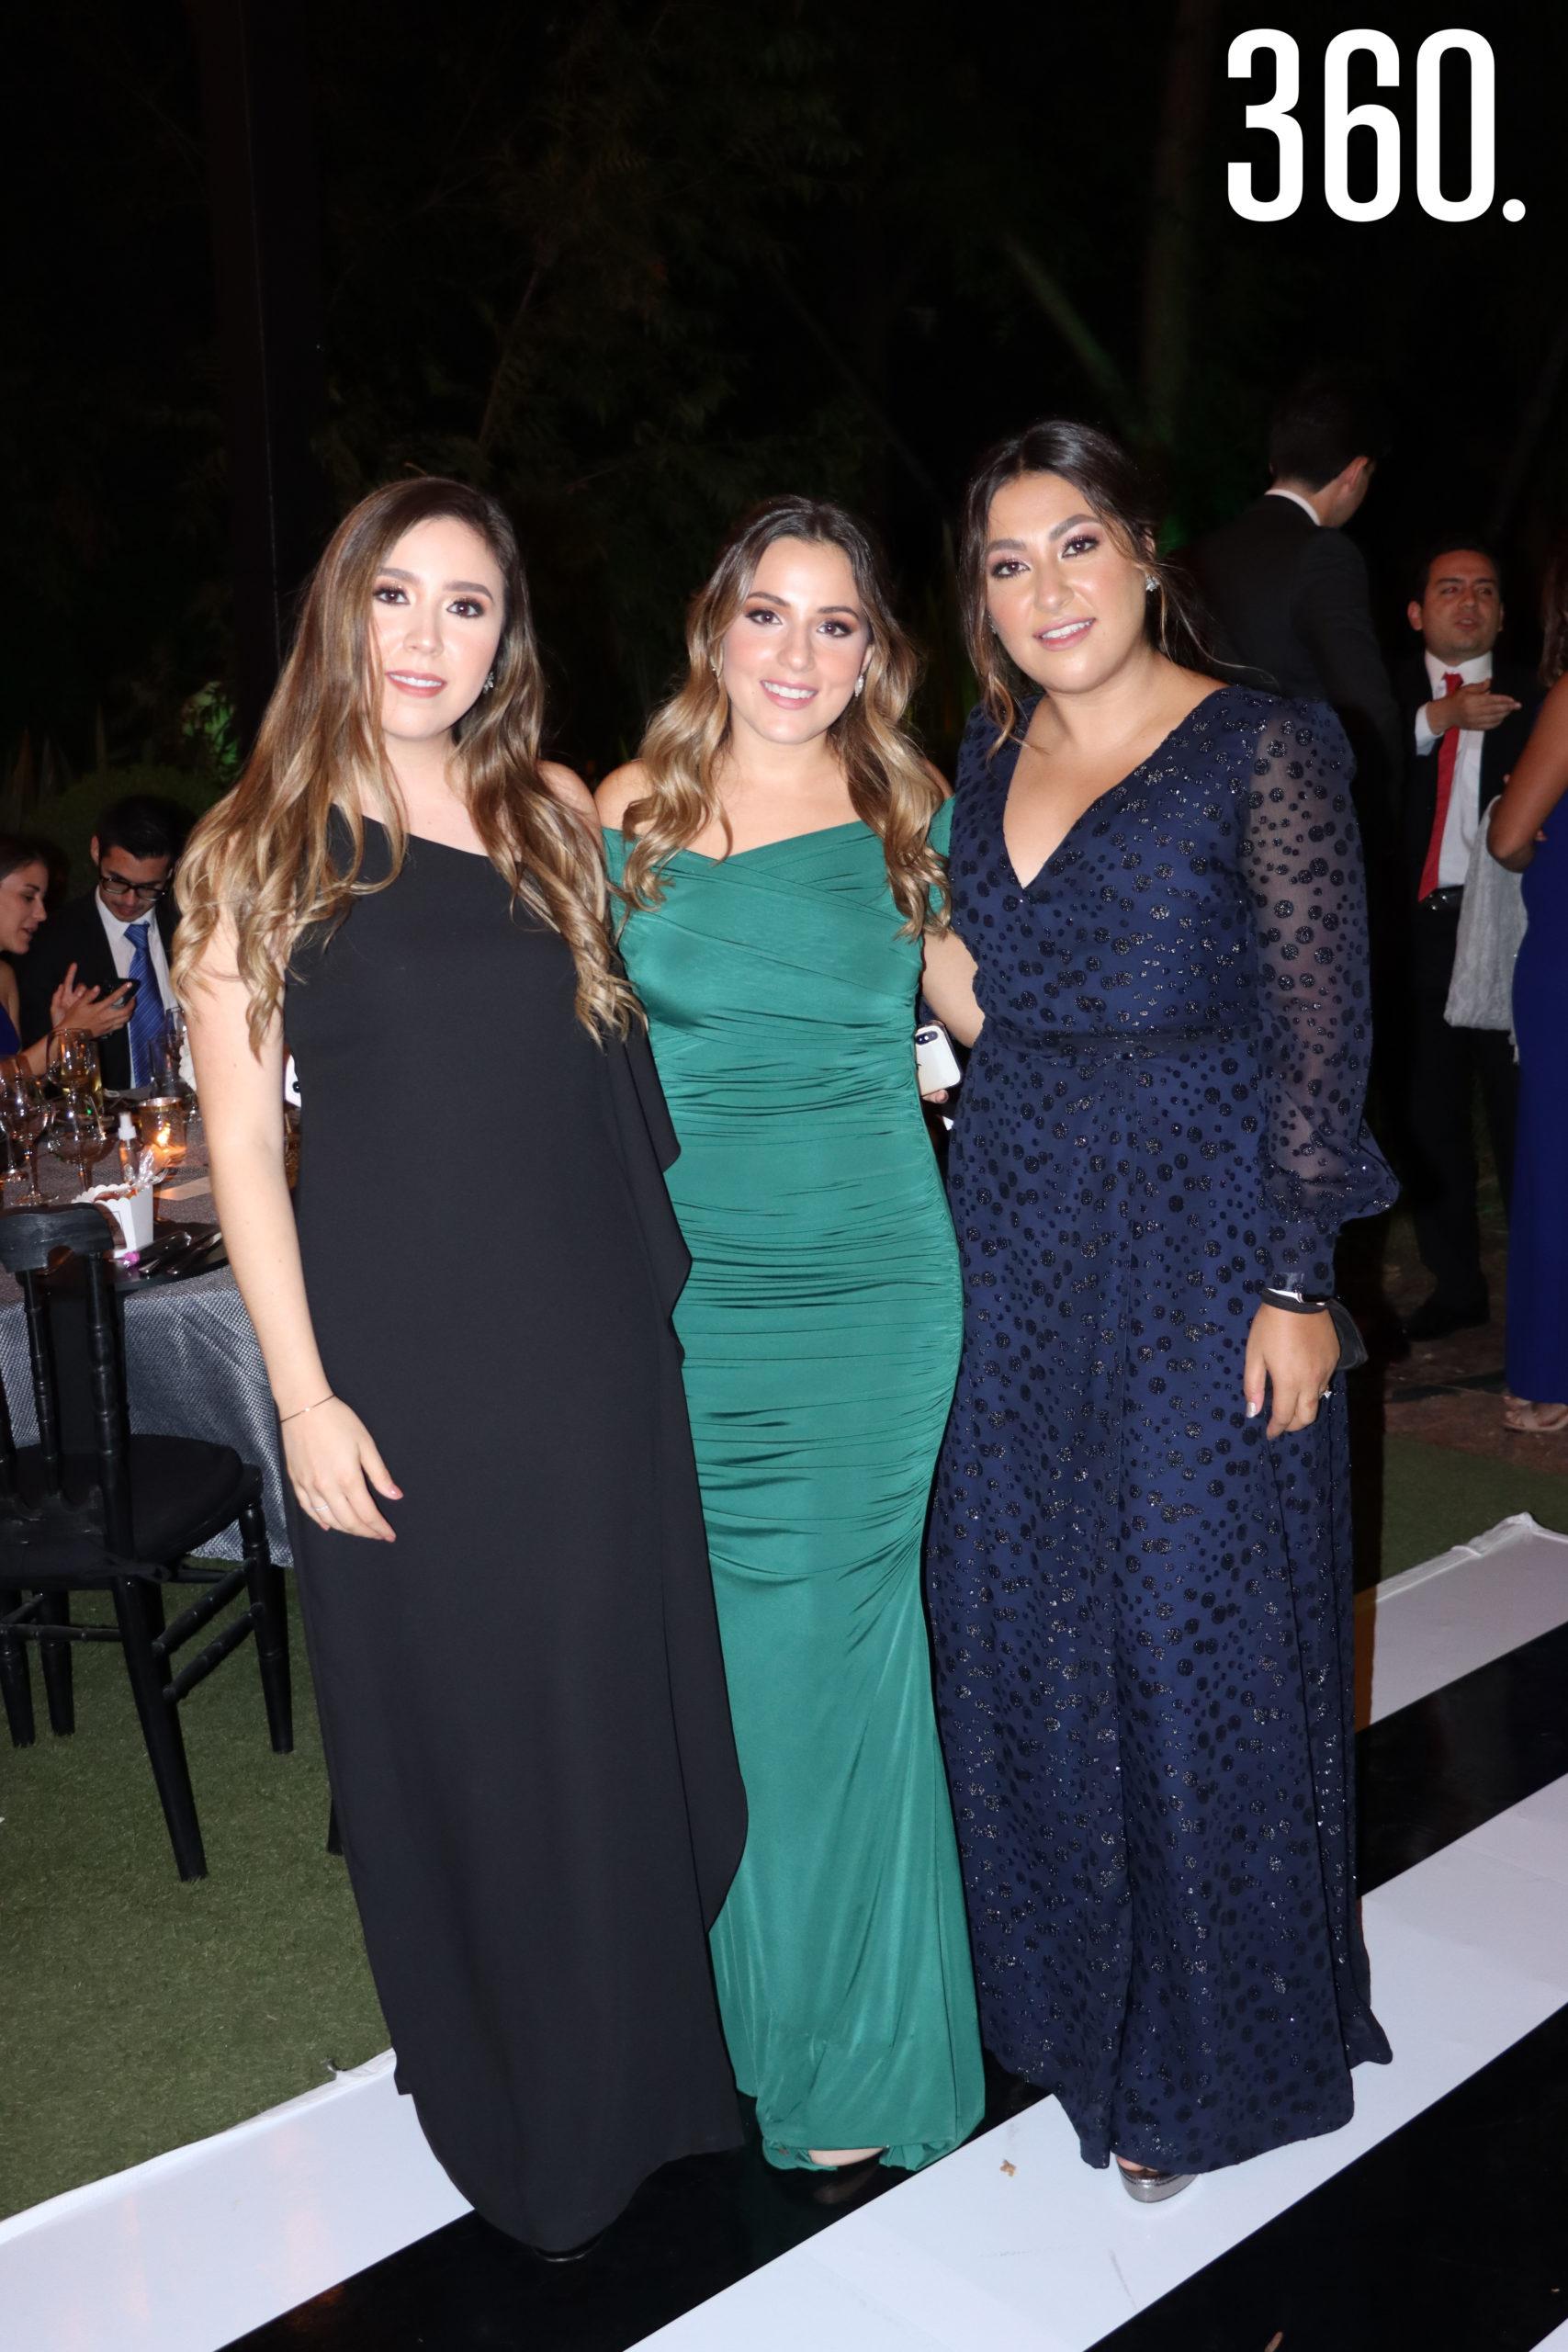 Alejandra Sandoval, Ana Karen Salinas y Lorena Dávila.